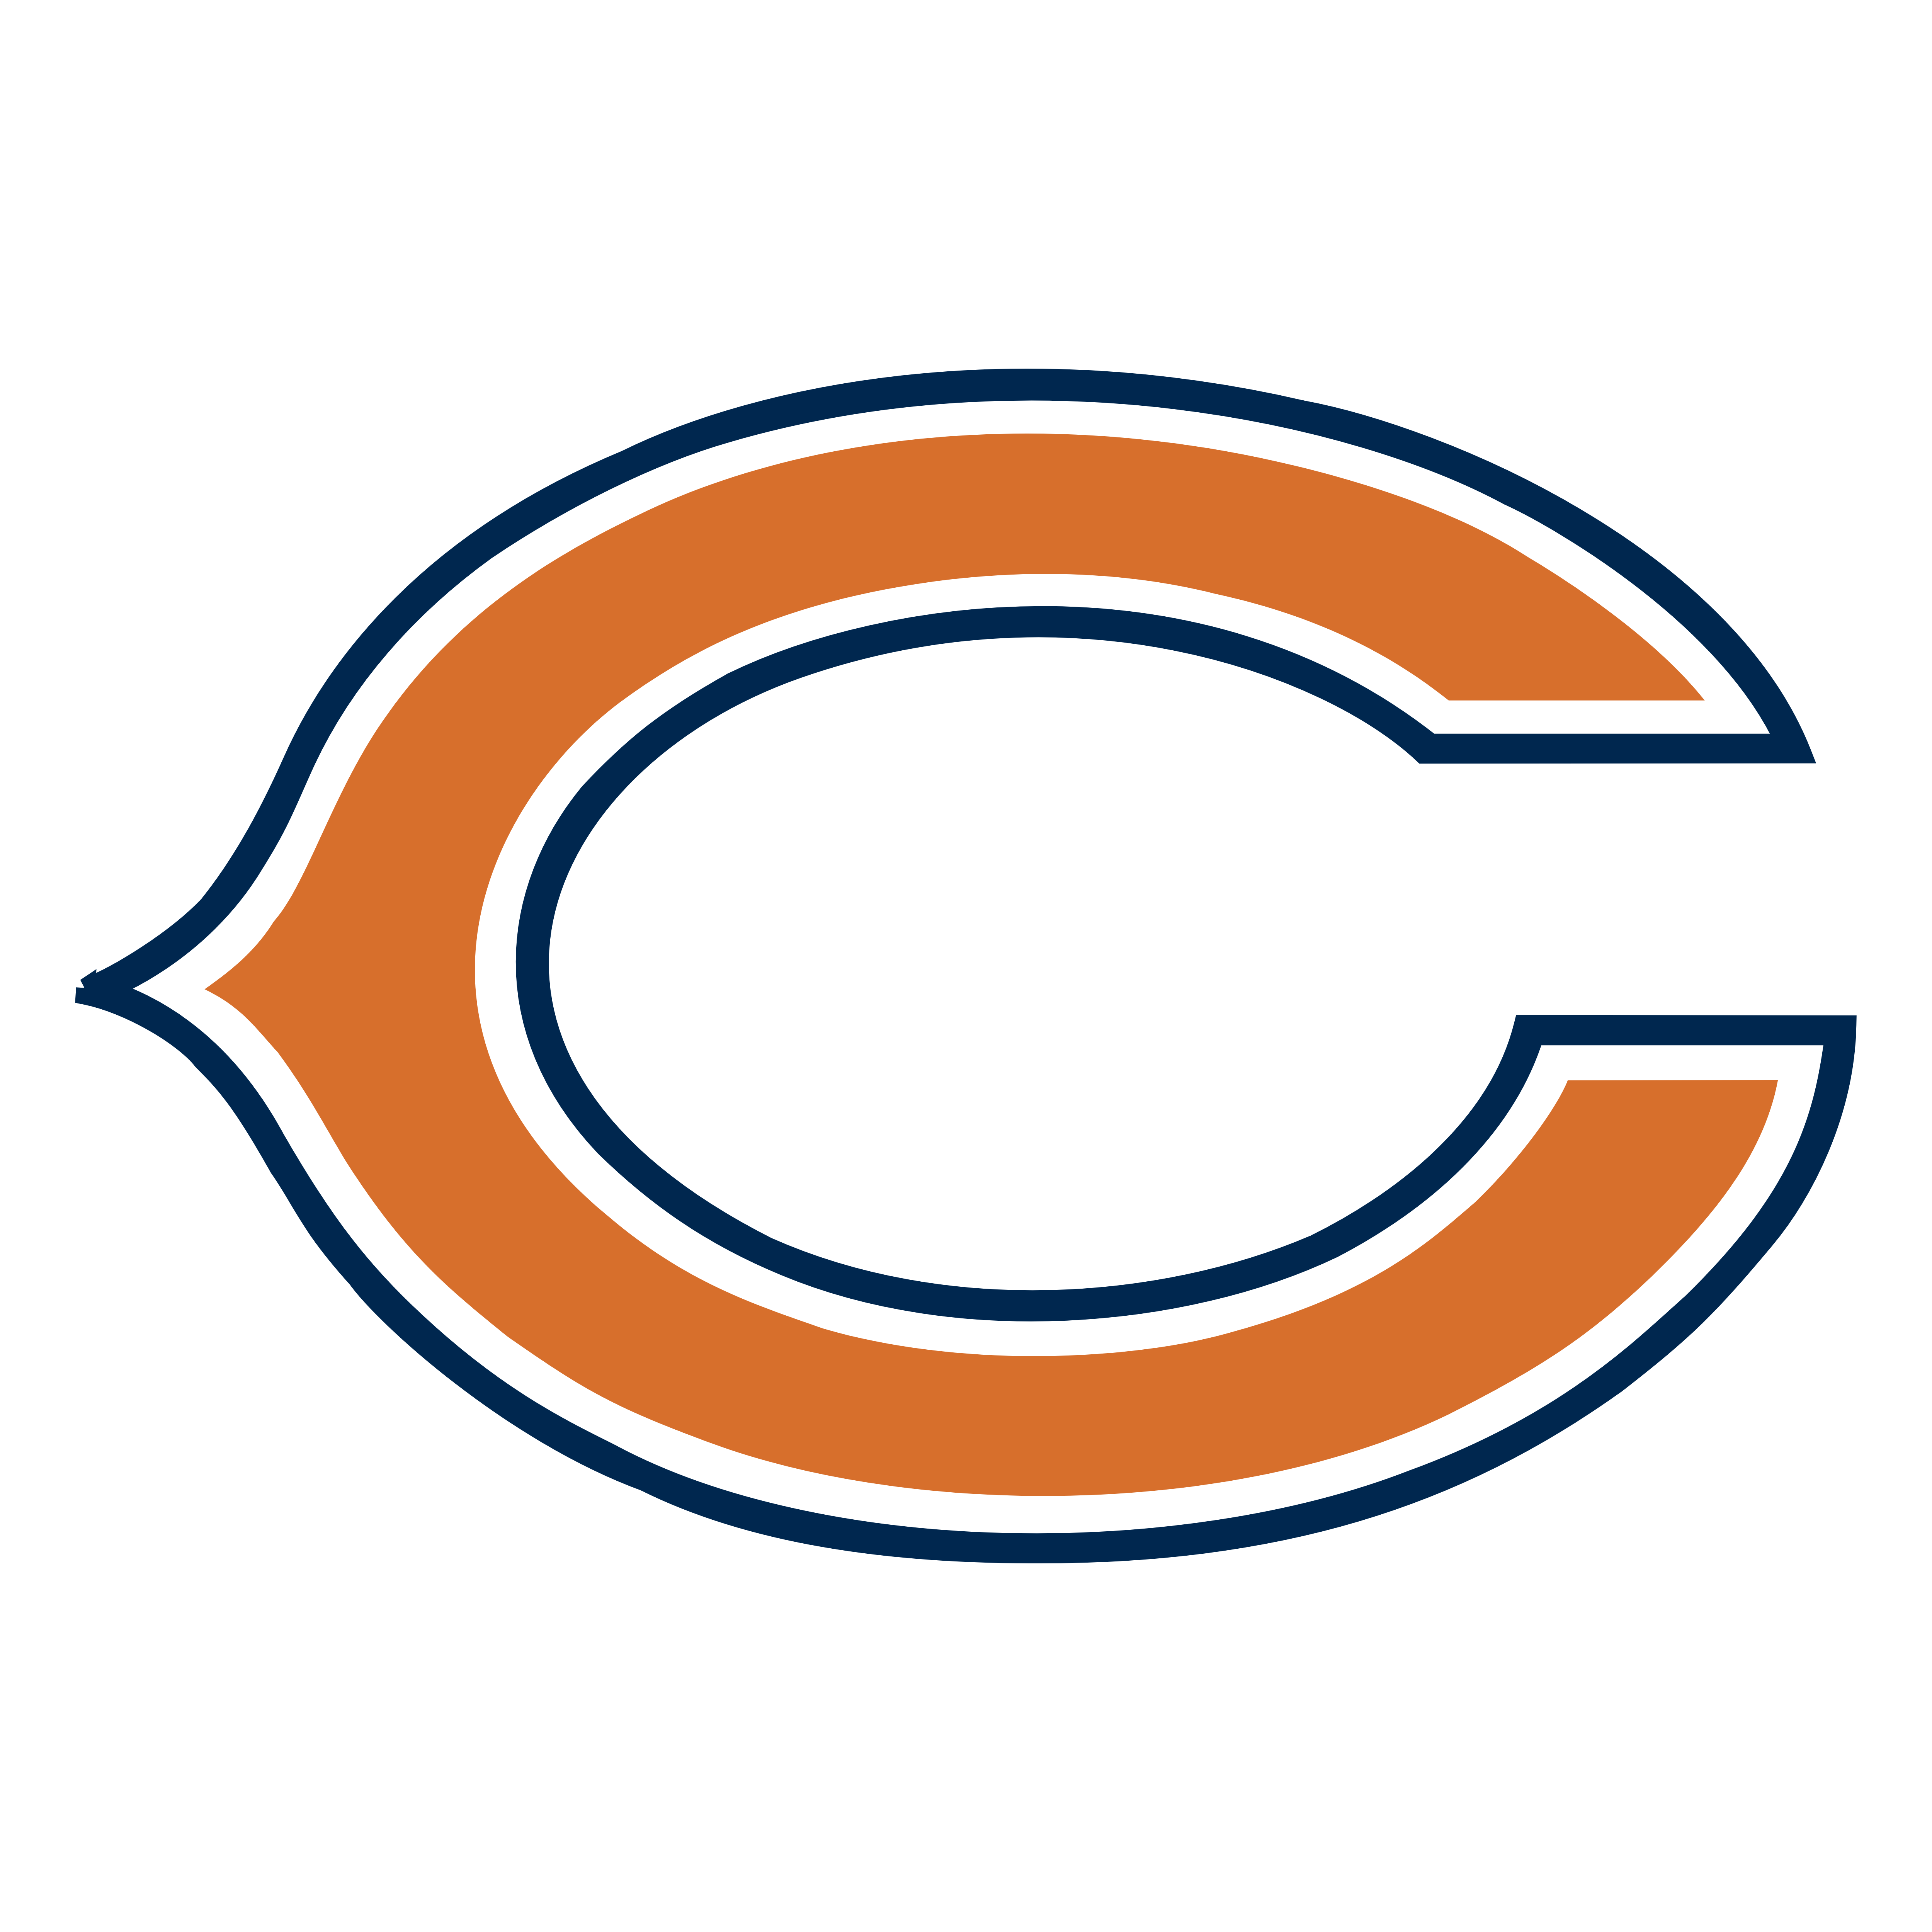 chicago bears � logos download